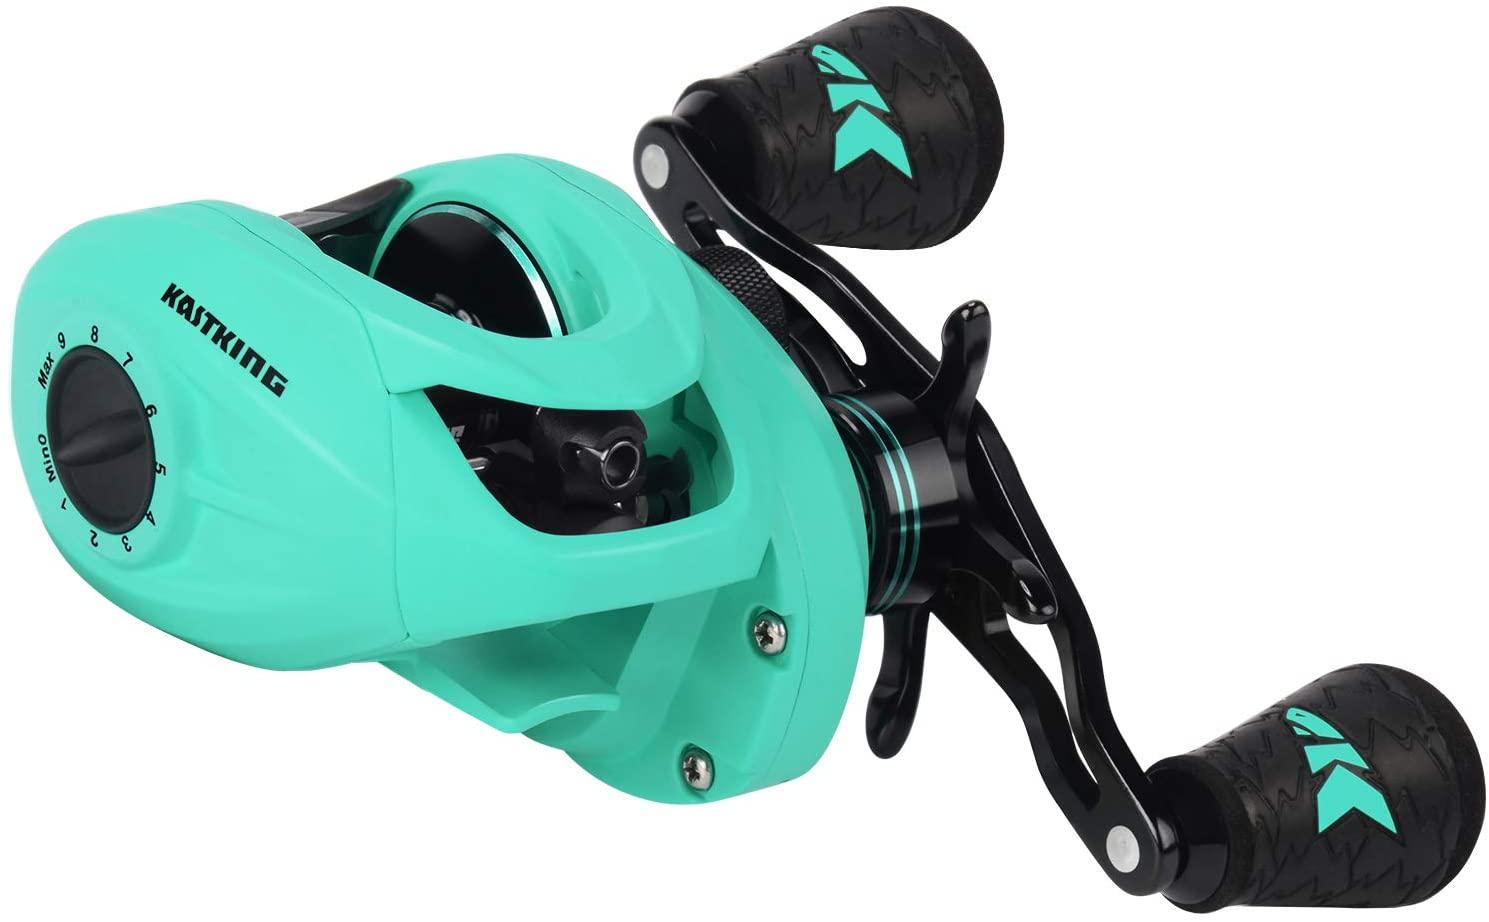 KastKing Crixus Baitcasting Reels, 6.5:1/7.2:1 Gear Ratio Fishing Reels, 17.6lbs Carbon Disc Drag, Super Polymer Grips,Carbon Infused Nylon Frame,8-pc Magnetic Brake, Low Profile Reel.